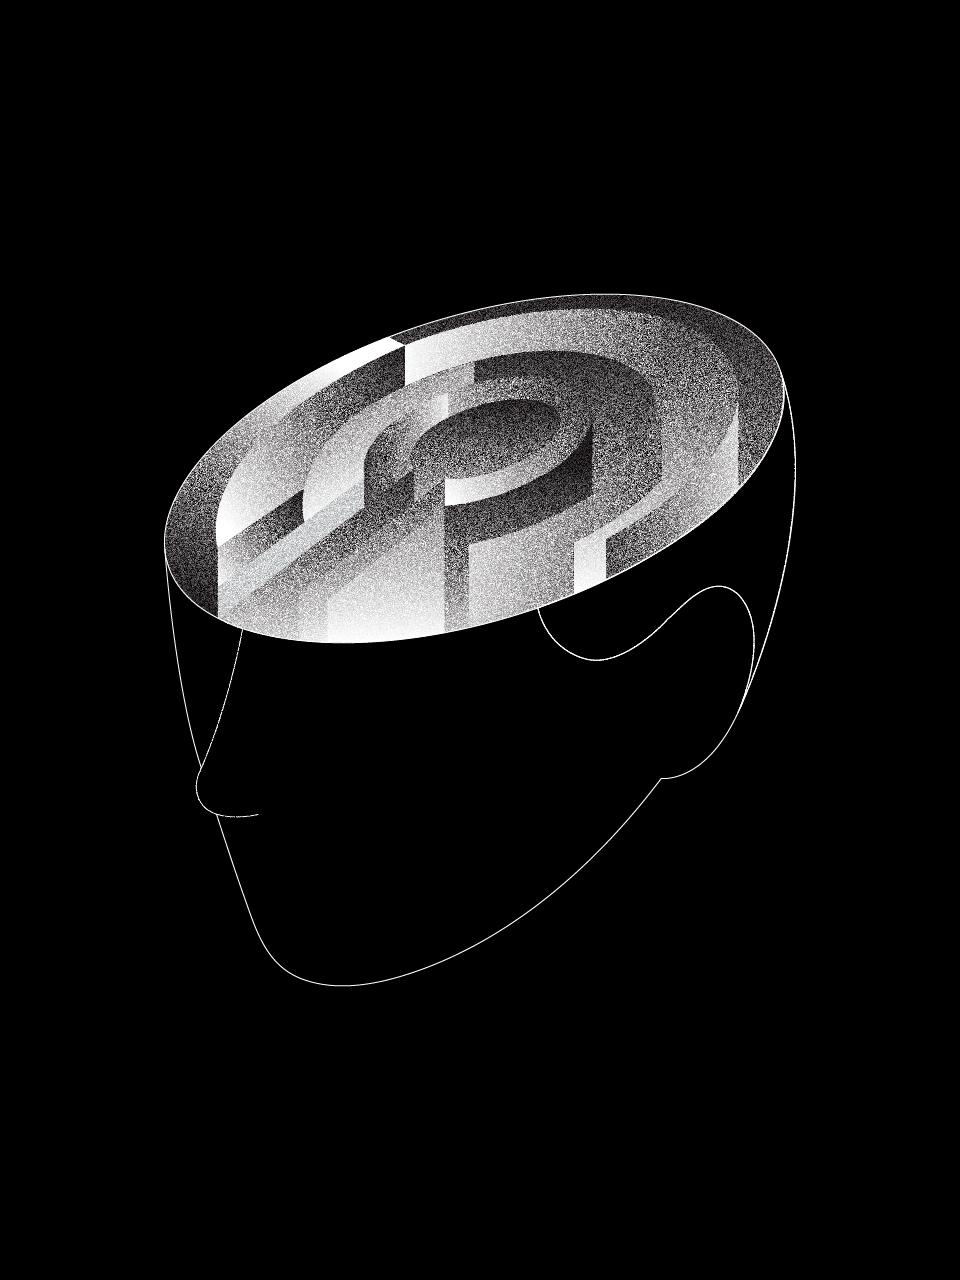 Mind-Labyrinth-black